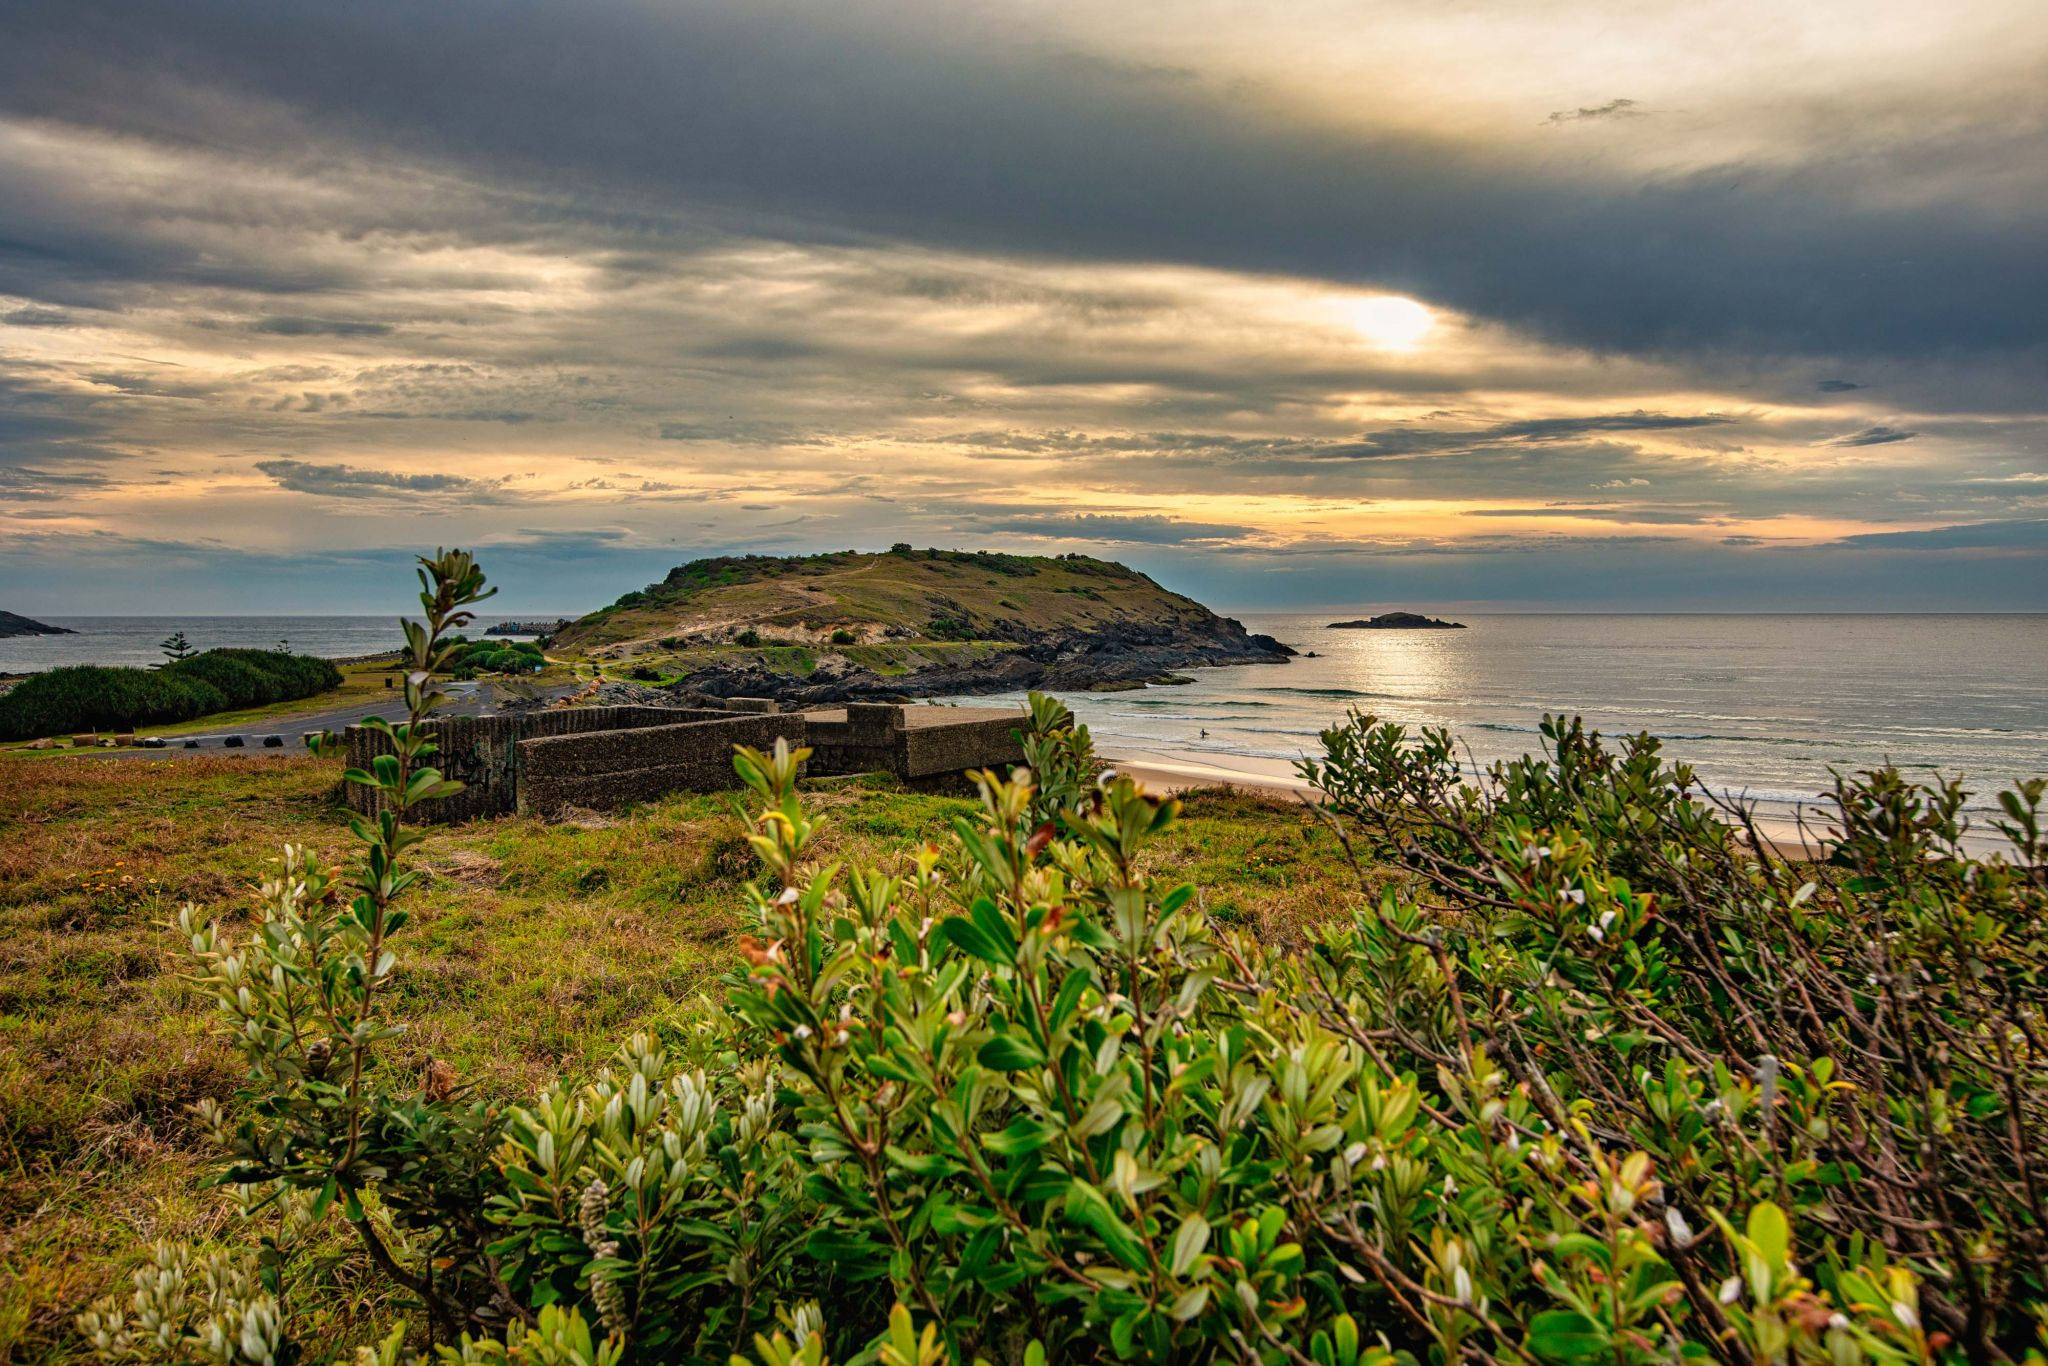 WWII Coastal Observation Bunker Coffs Harbour NSW, Australia